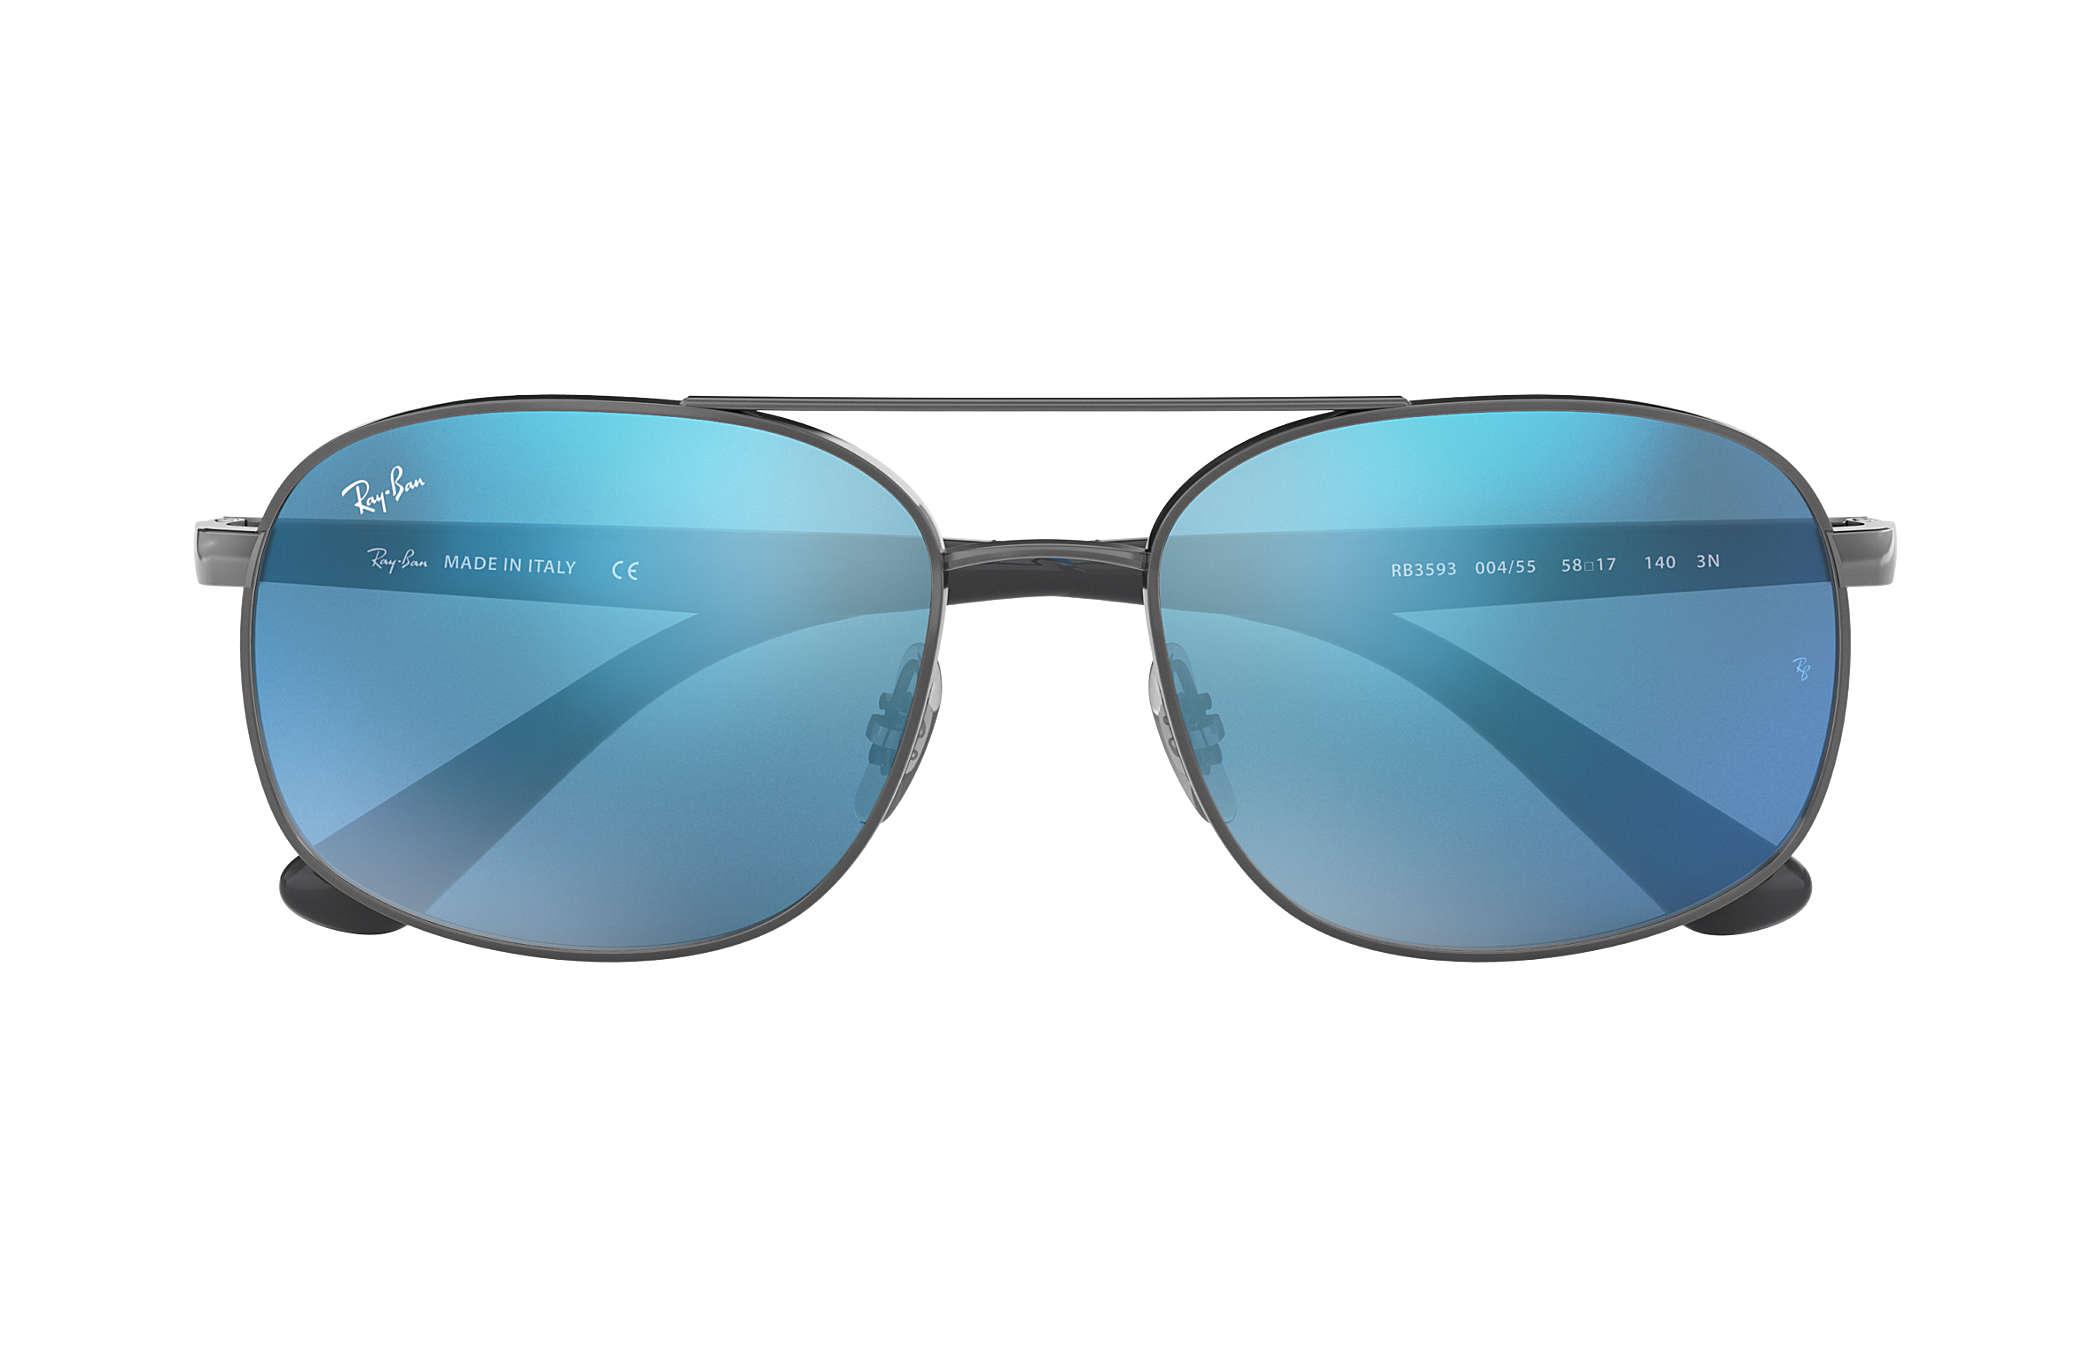 51ea672cad Ray-Ban RB3593 Gunmetal - Steel - Blue Lenses - 0RB3593004 5558 ...